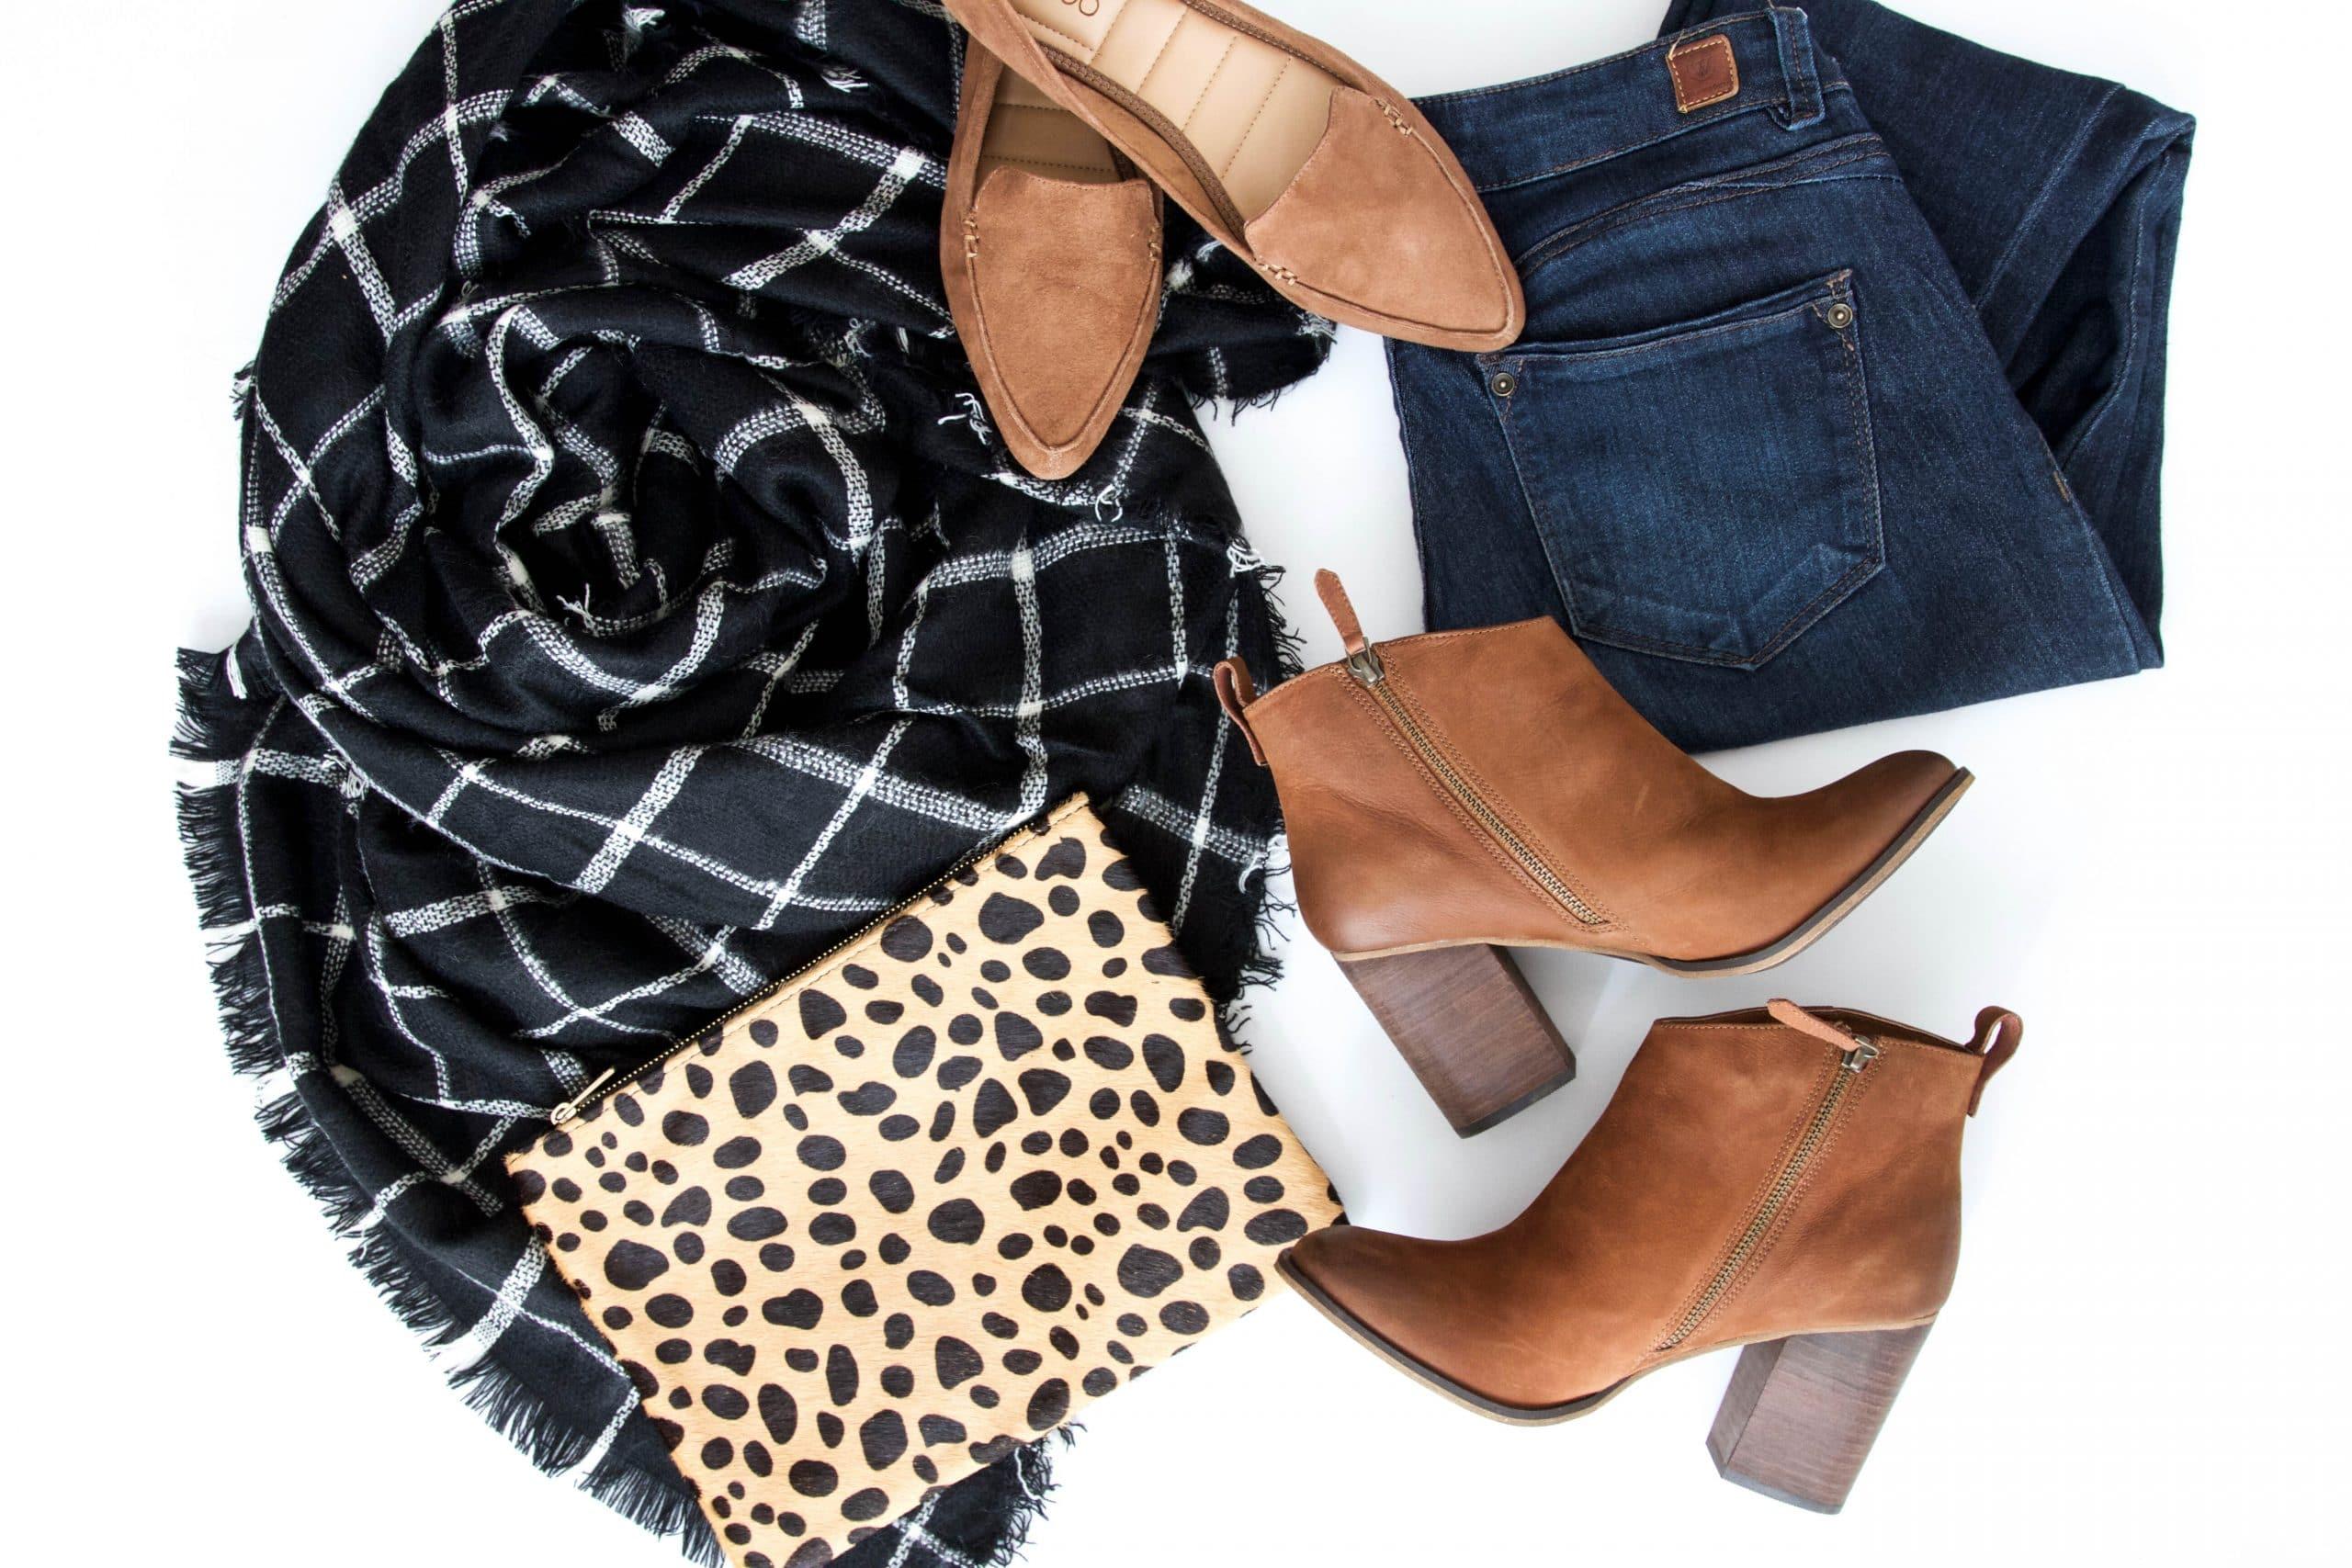 Scarf + Leopard Clutch + Booties + Wit & Wisdom Jeans